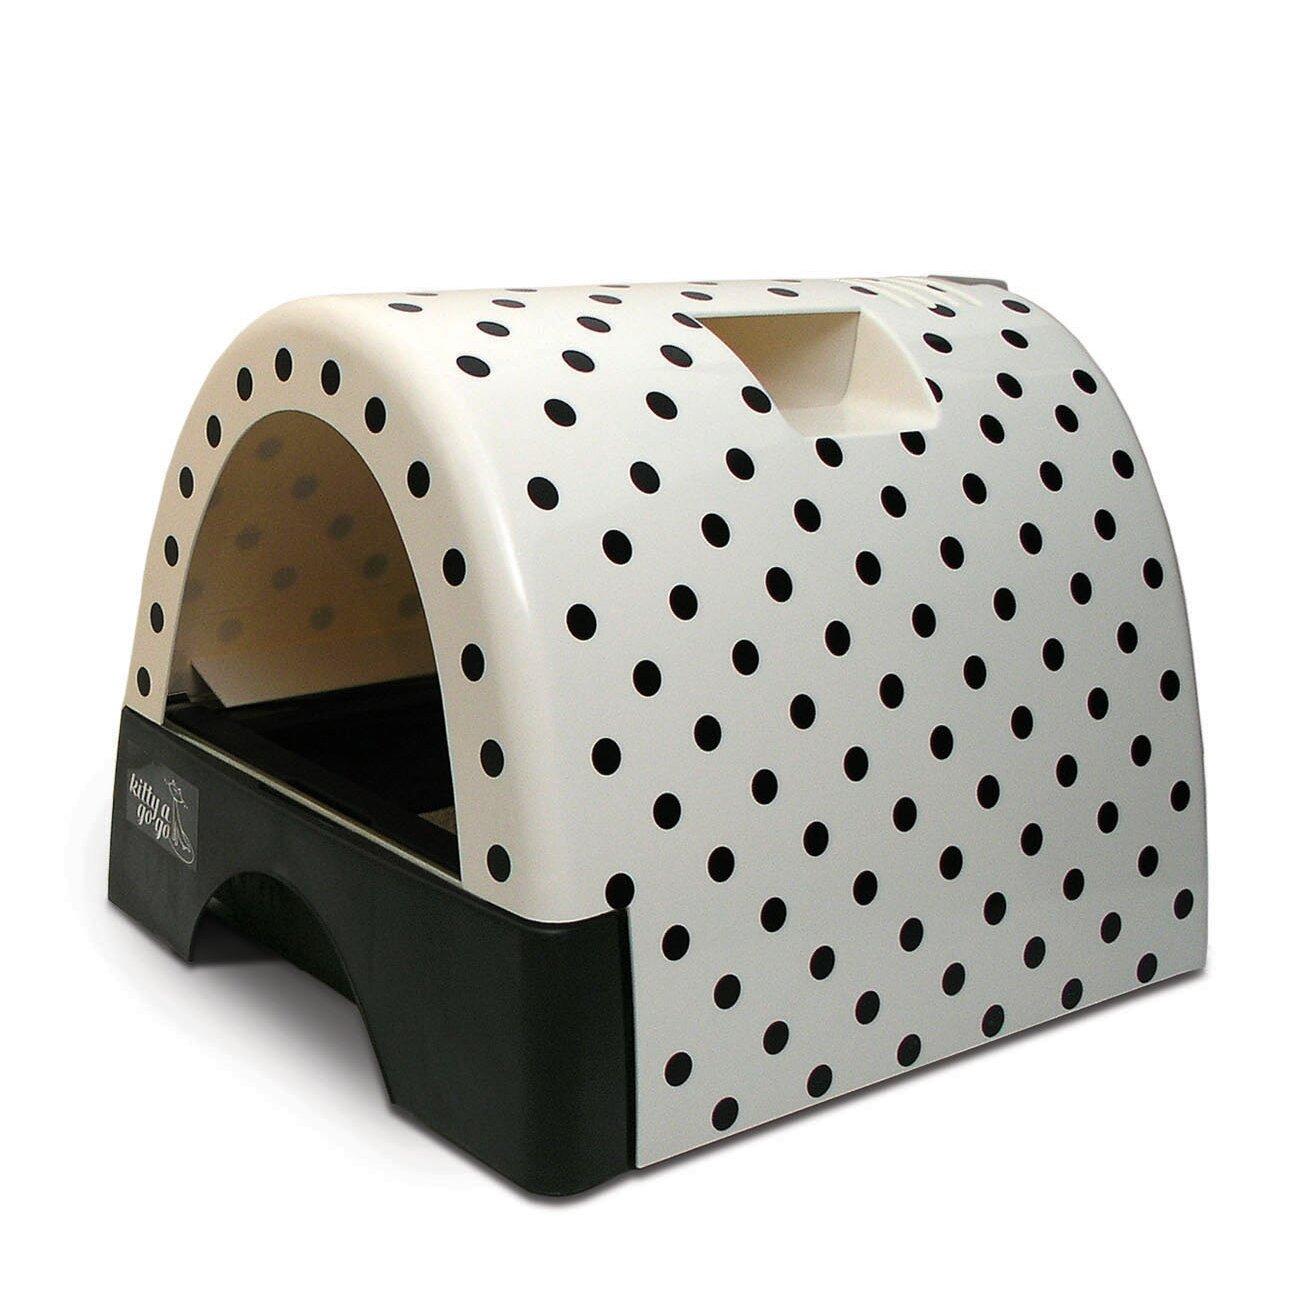 kittyagogo designer cat litter box with polka dot cover. Black Bedroom Furniture Sets. Home Design Ideas